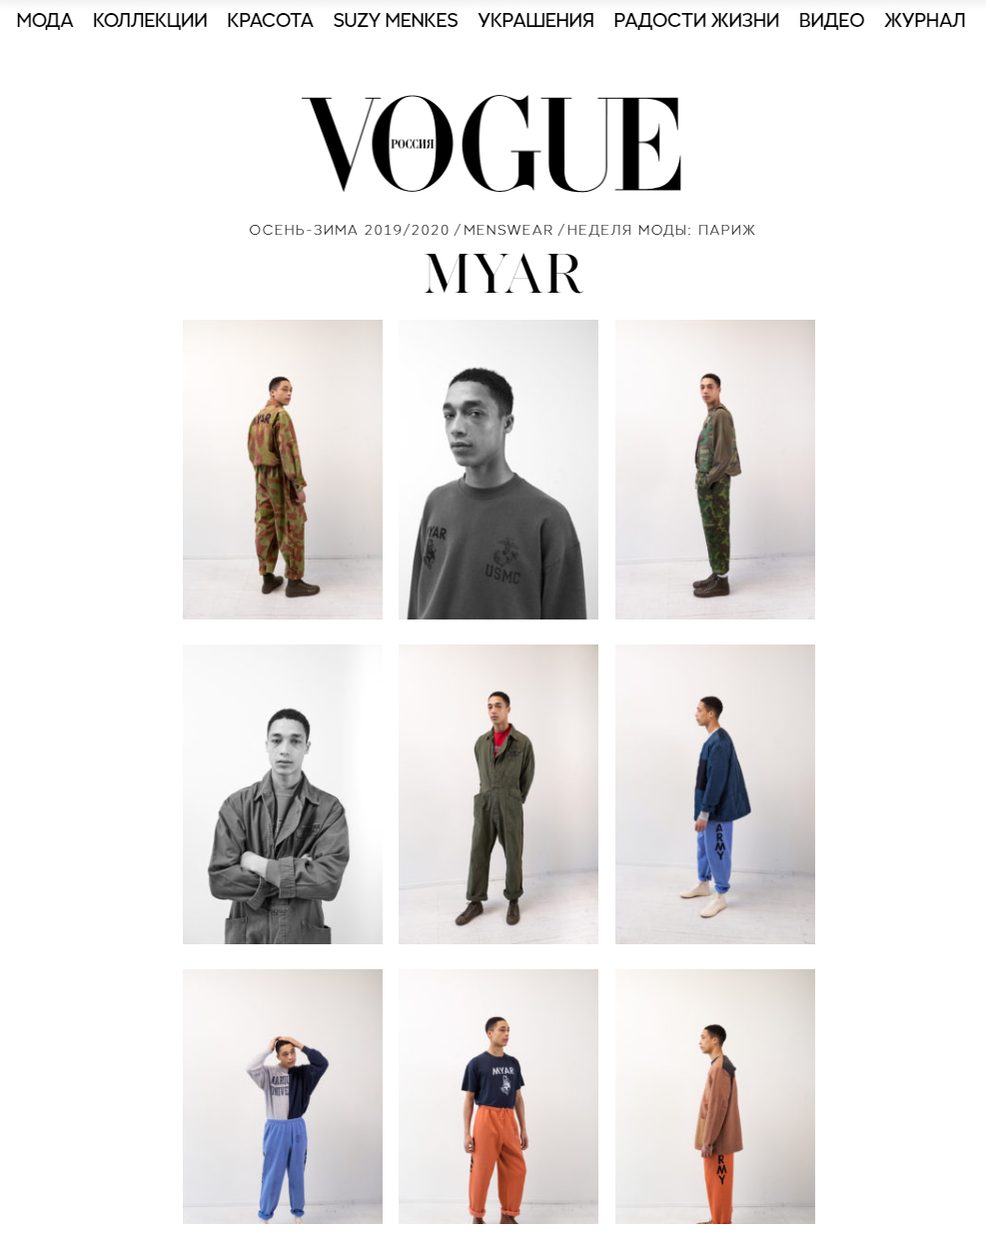 MYAR_Vogue Russia Online - 21.01.2019.png